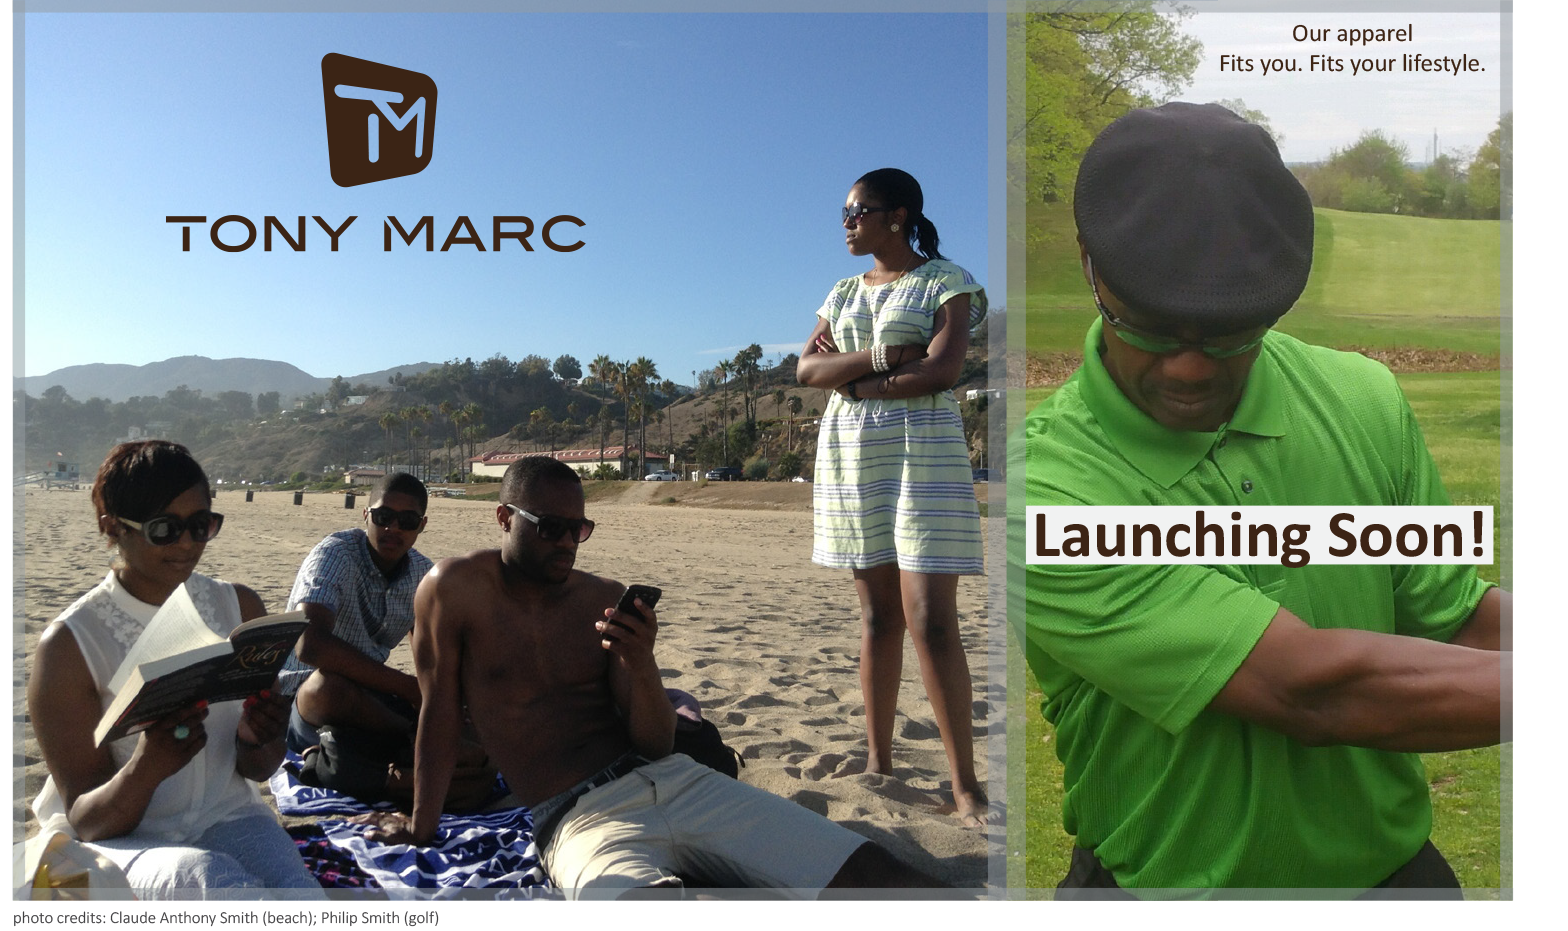 TM-Launching-Soon-Ad